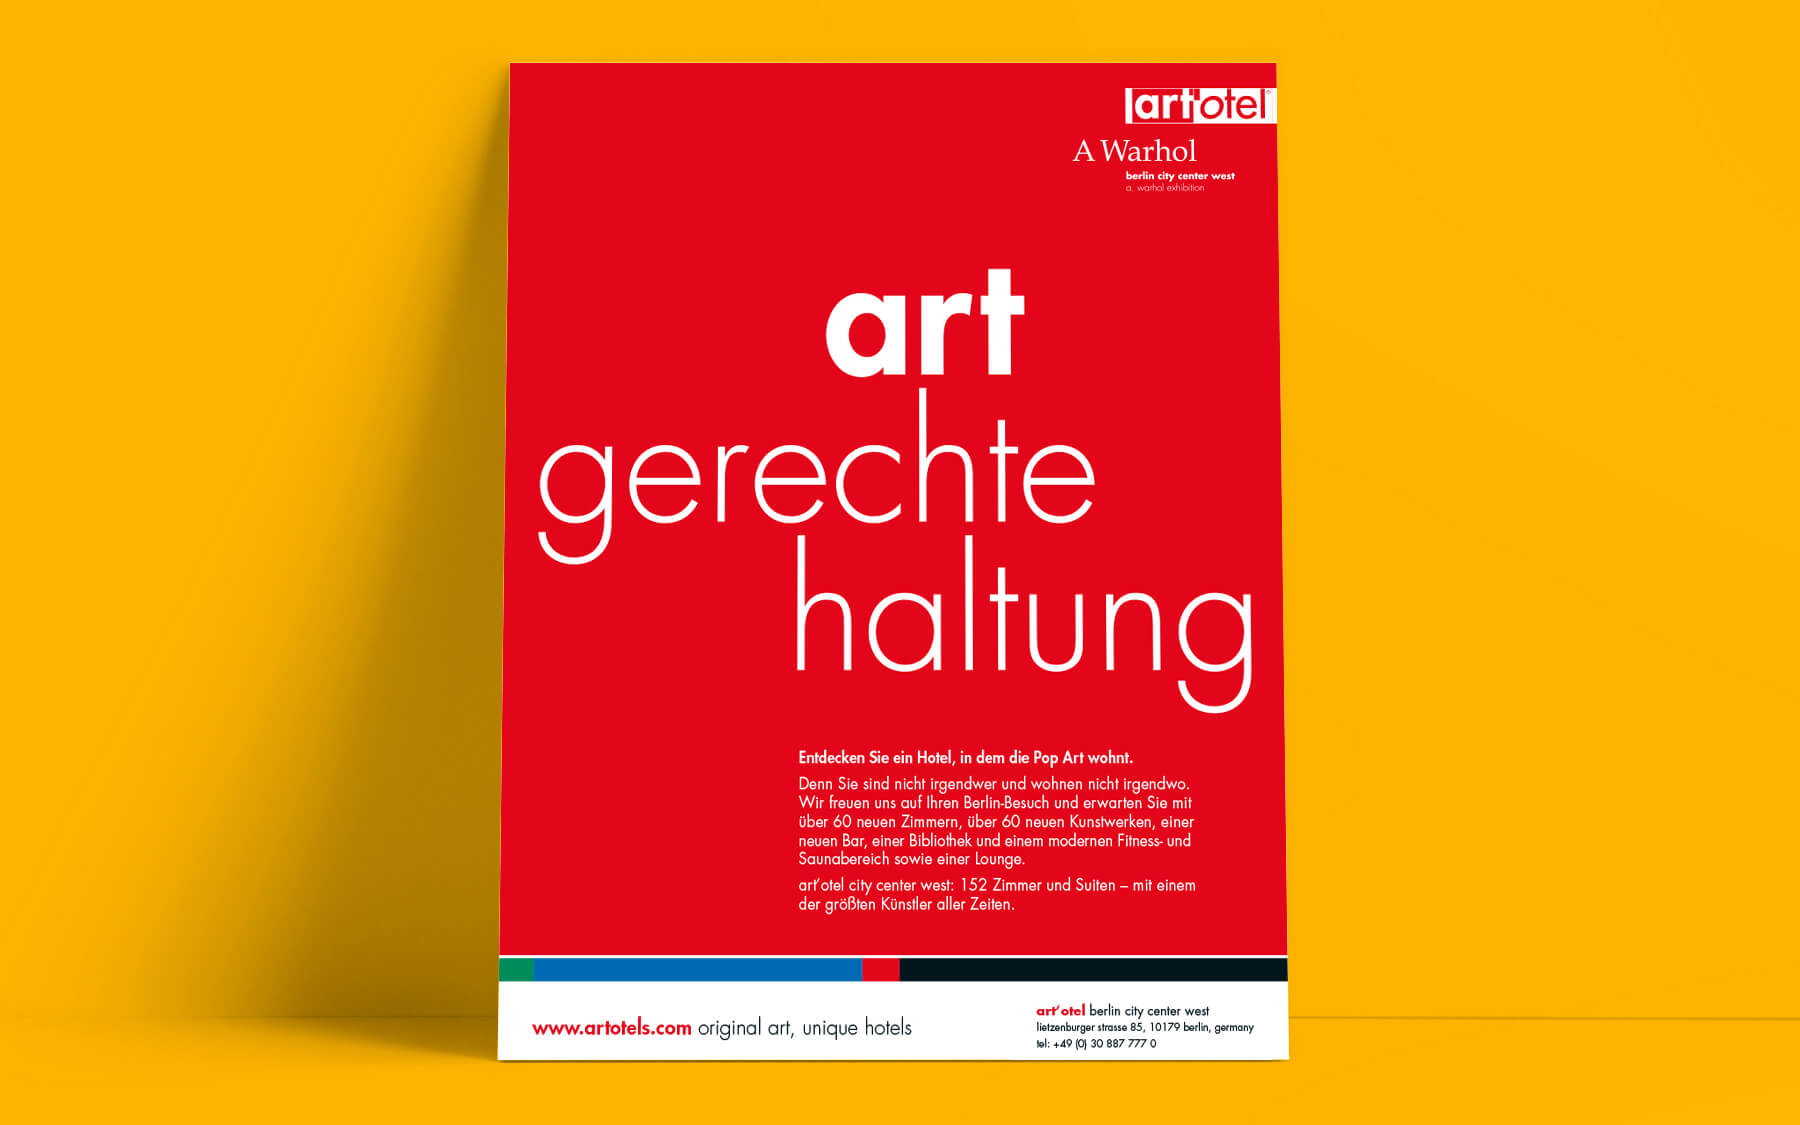 kreativagentur berlin creativ ideenschmiede factory werbeagentur berlin sued art hotel otel gerechte haltung